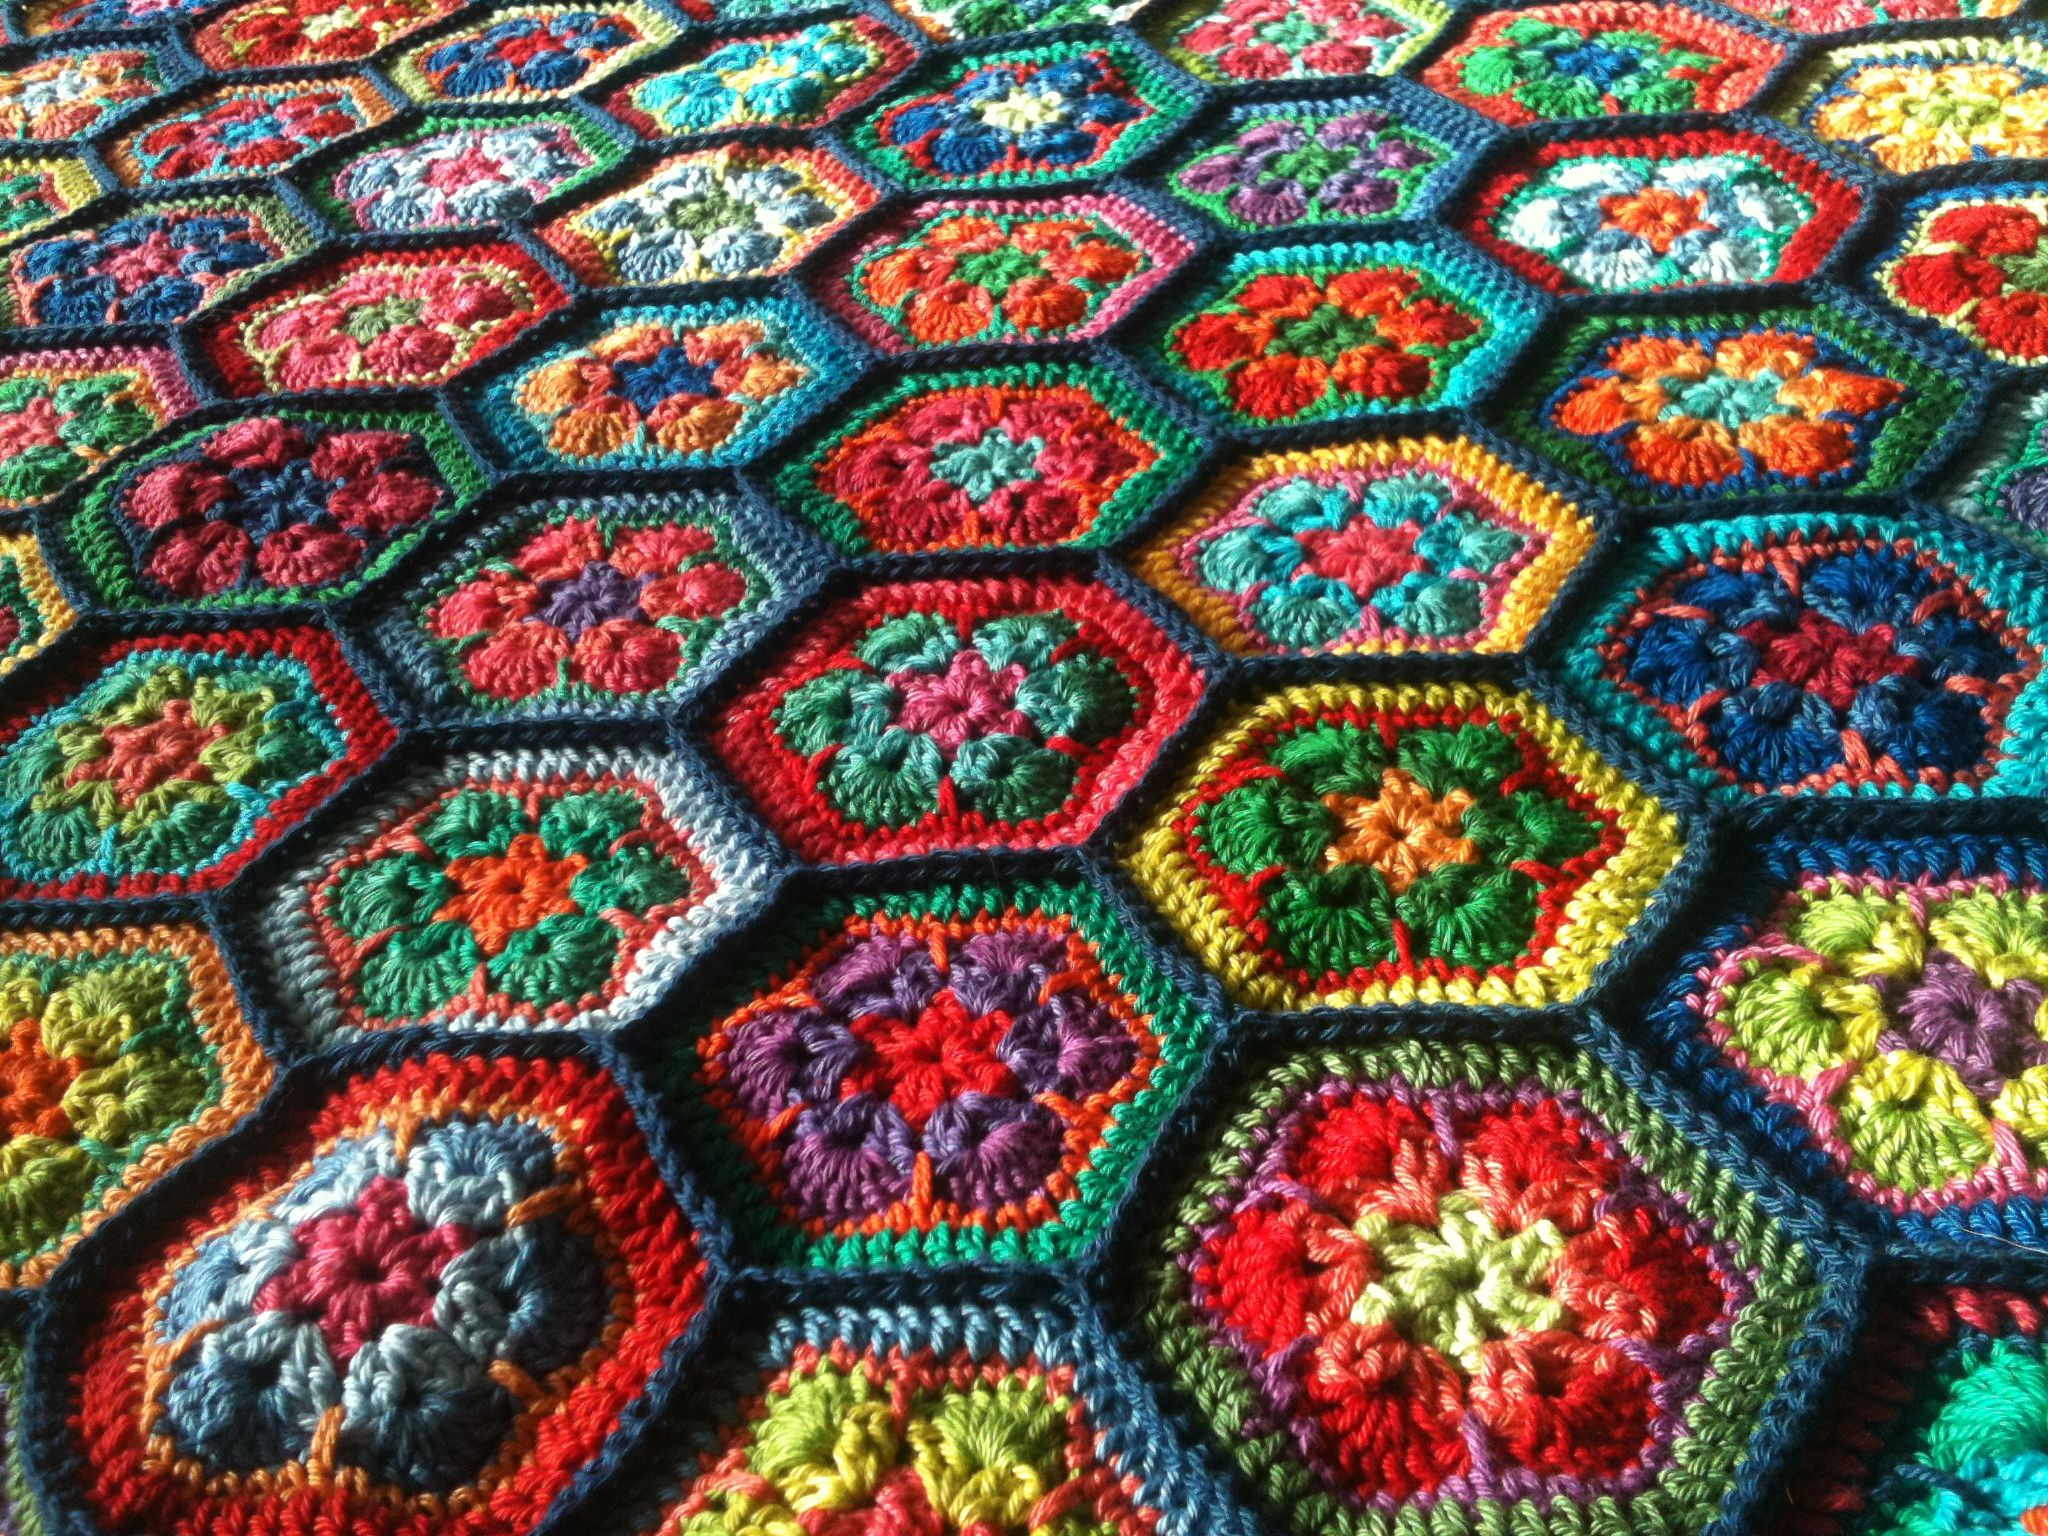 Crochet blanket - afghan flower pattern crochet afghan ...